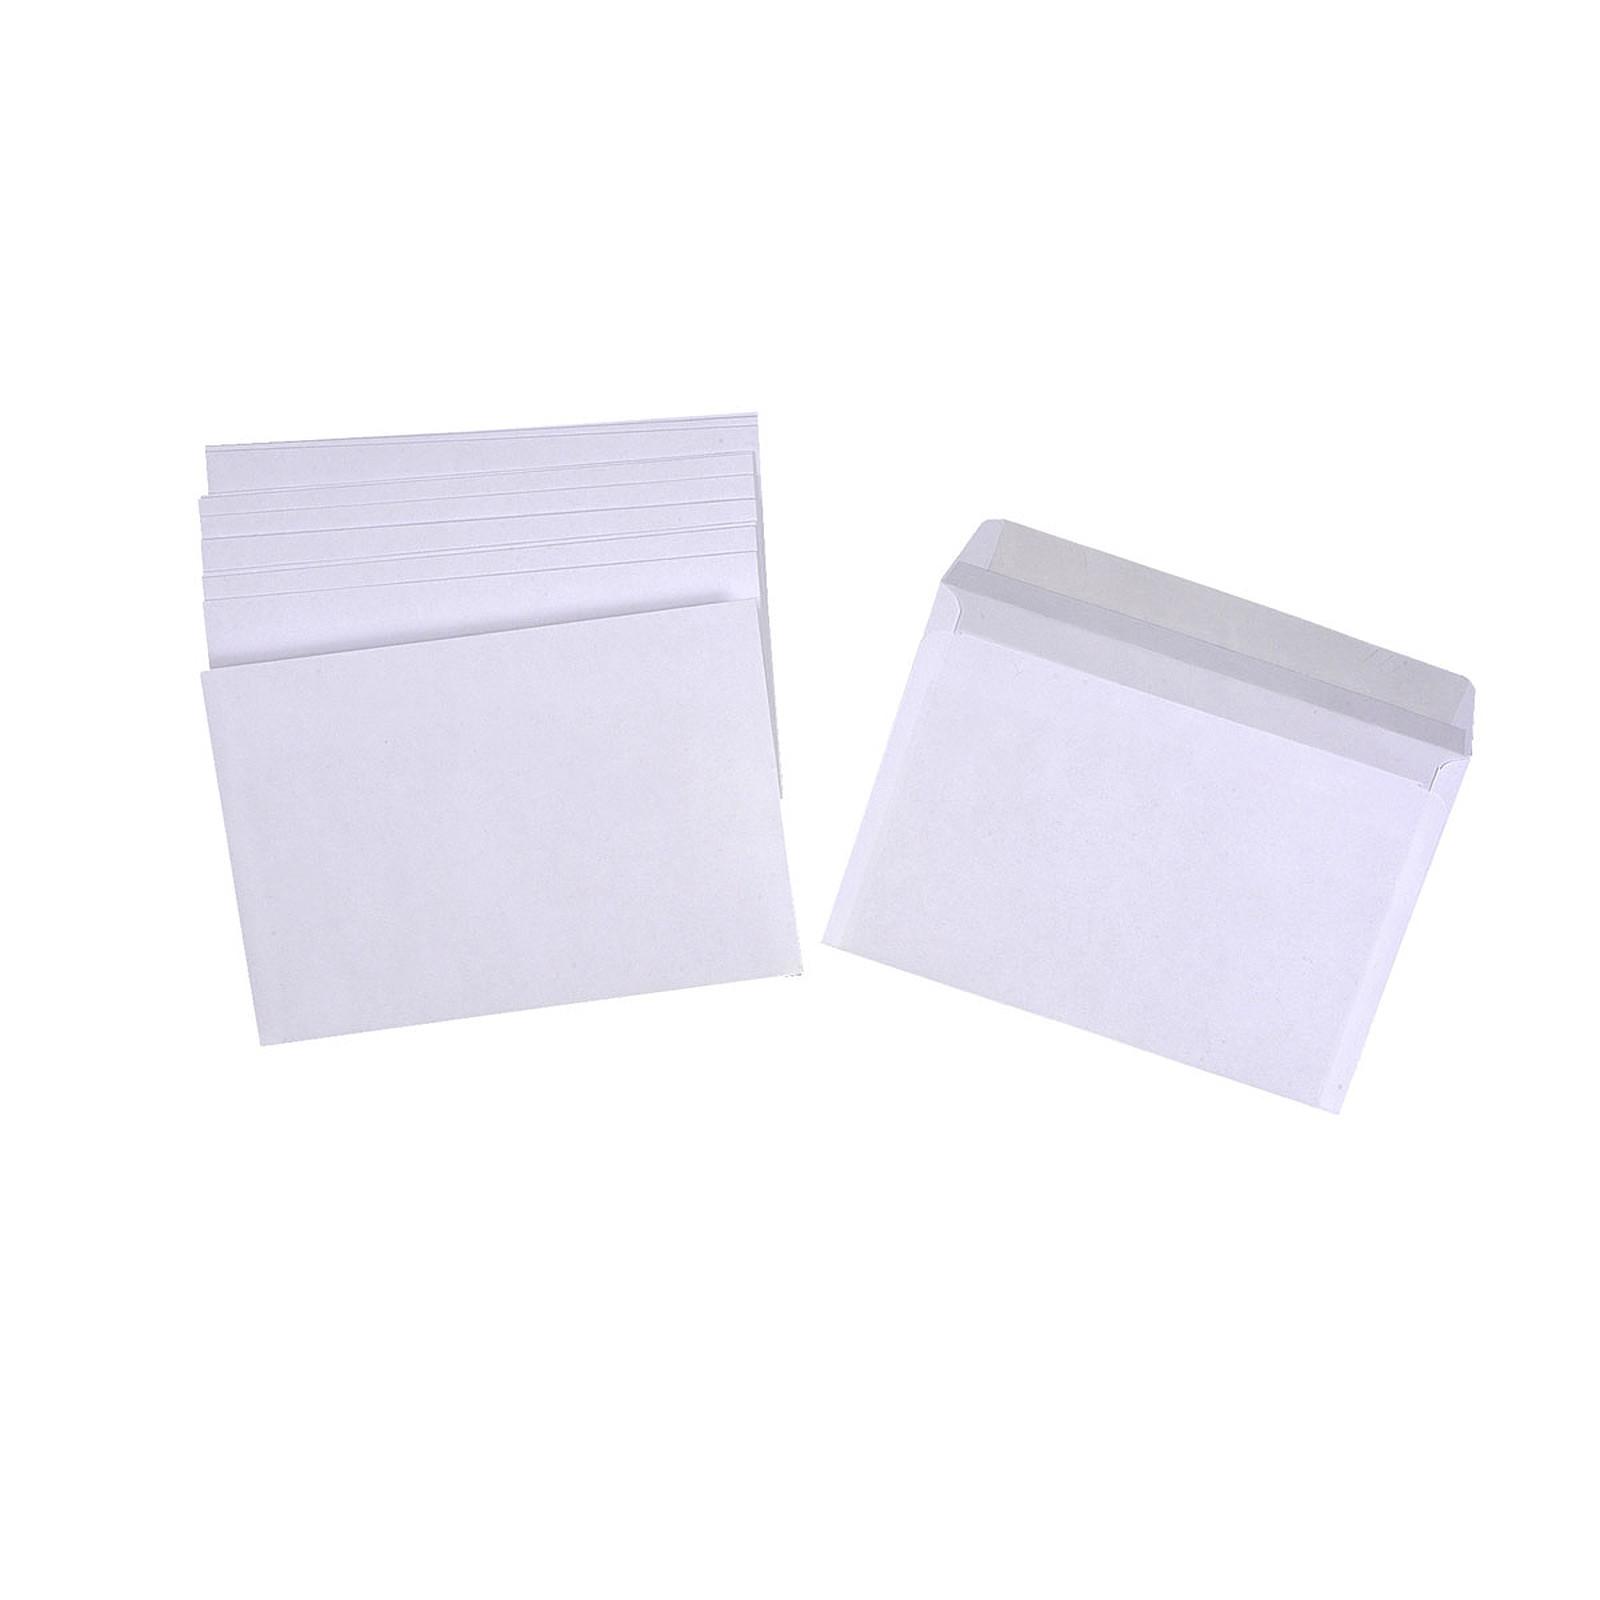 500 enveloppes C6 auto-adhésives 80g pleine